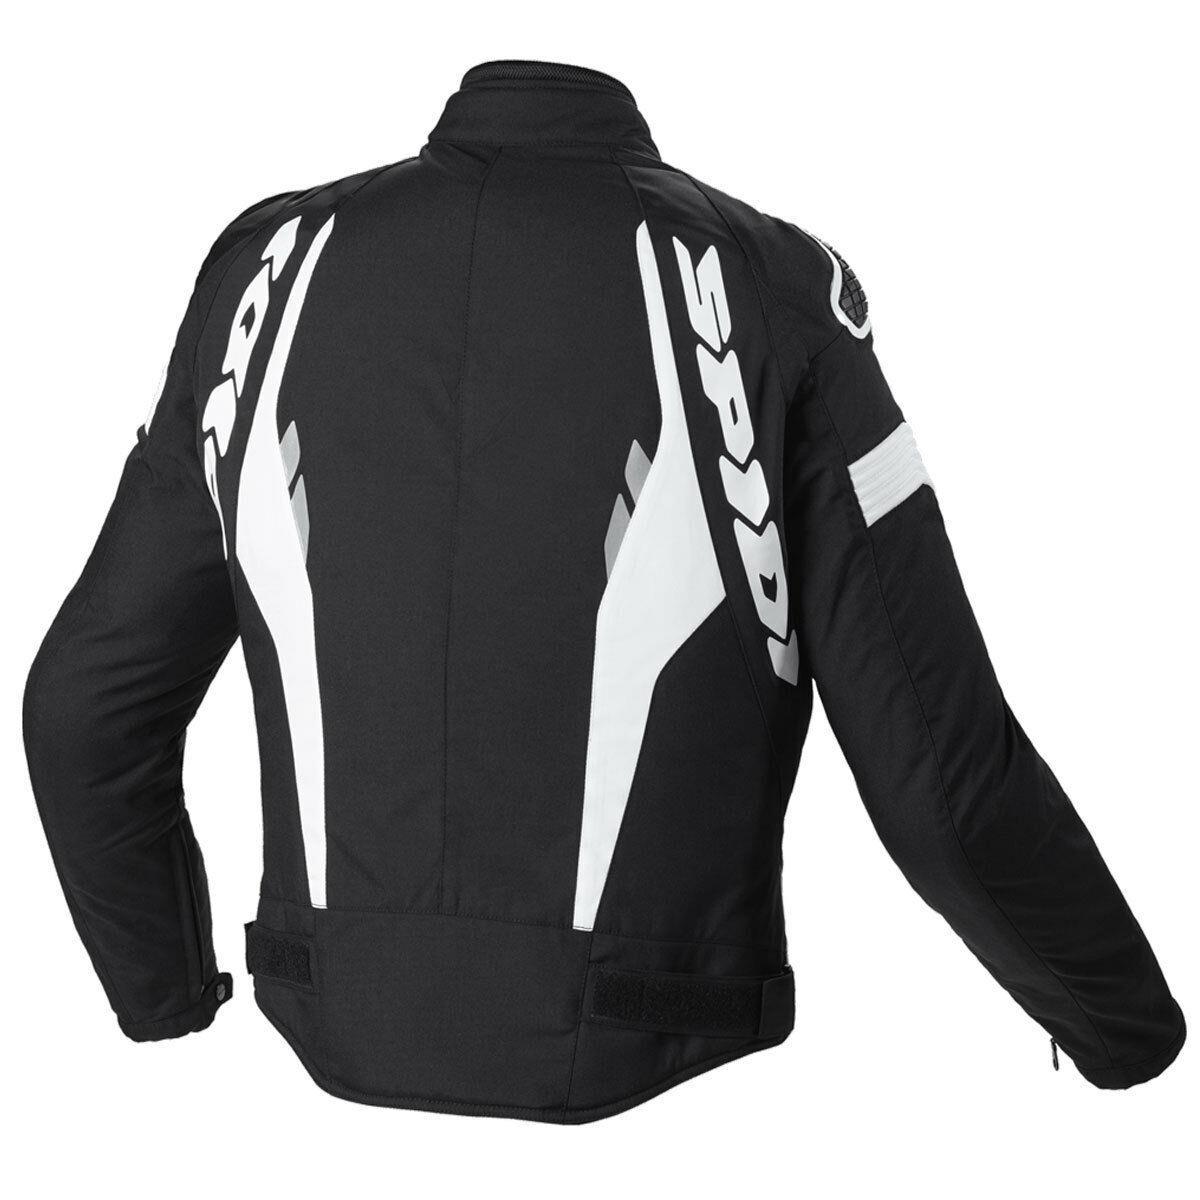 Spidi-H2Out-Warrior-Sports-Motorcycle-Motorbike-CE-Certified-Men-039-s-Jacket miniature 7